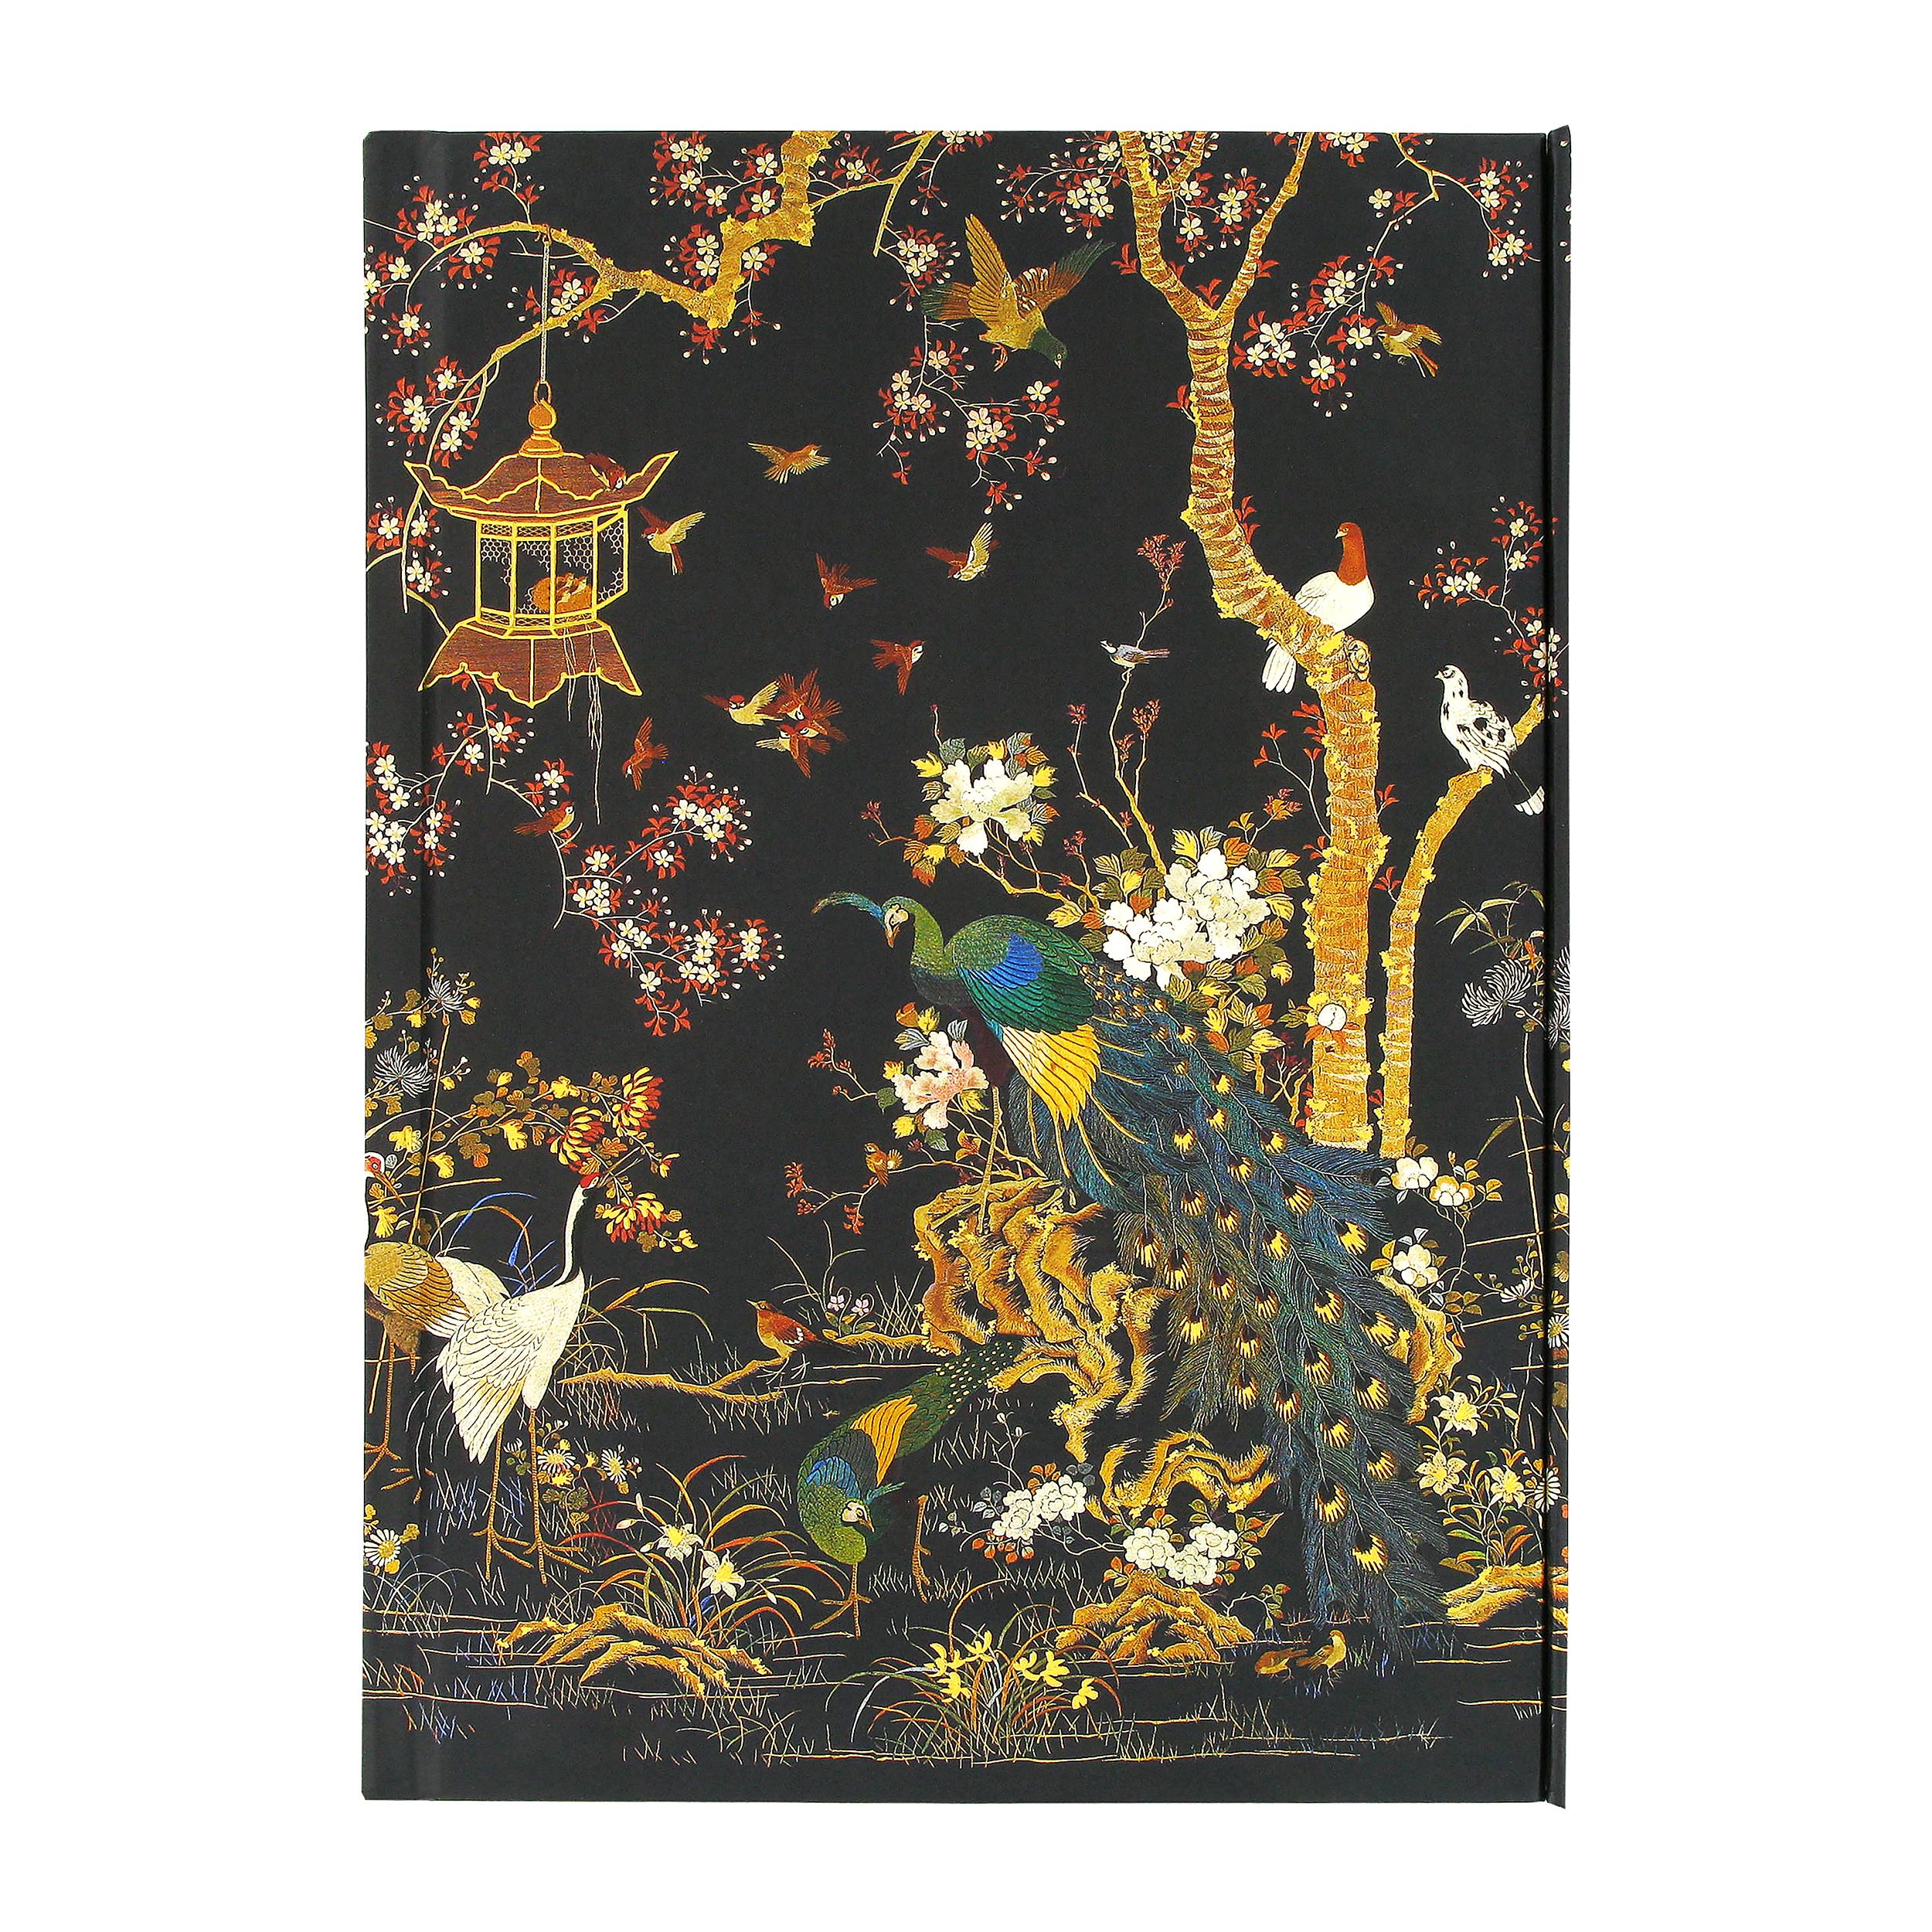 Ashmolean Museum notebook (embroidery)